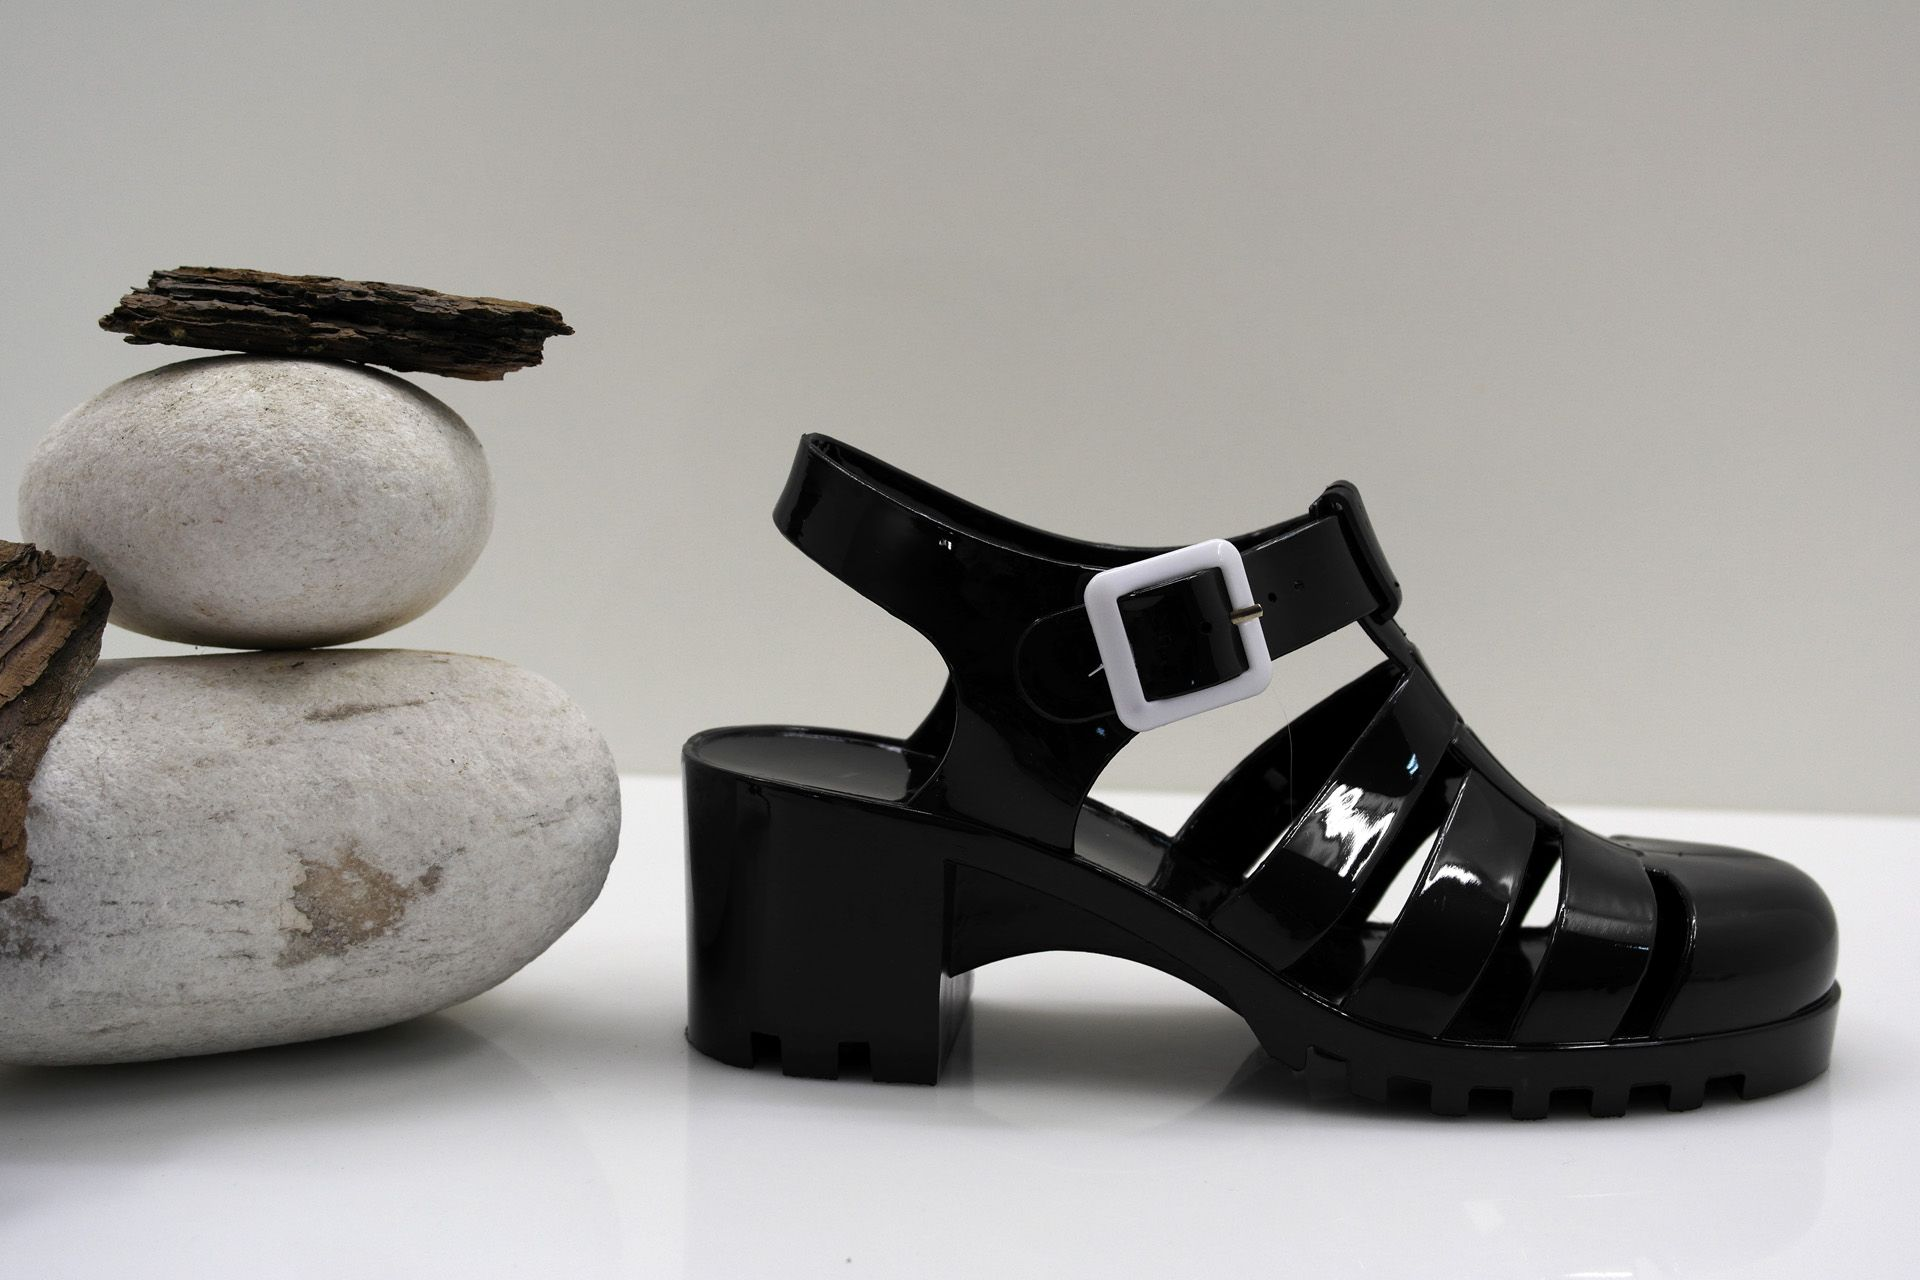 ea951f4794f ... Jelly Platform Sandals por Alexandra Sousa. Visitar